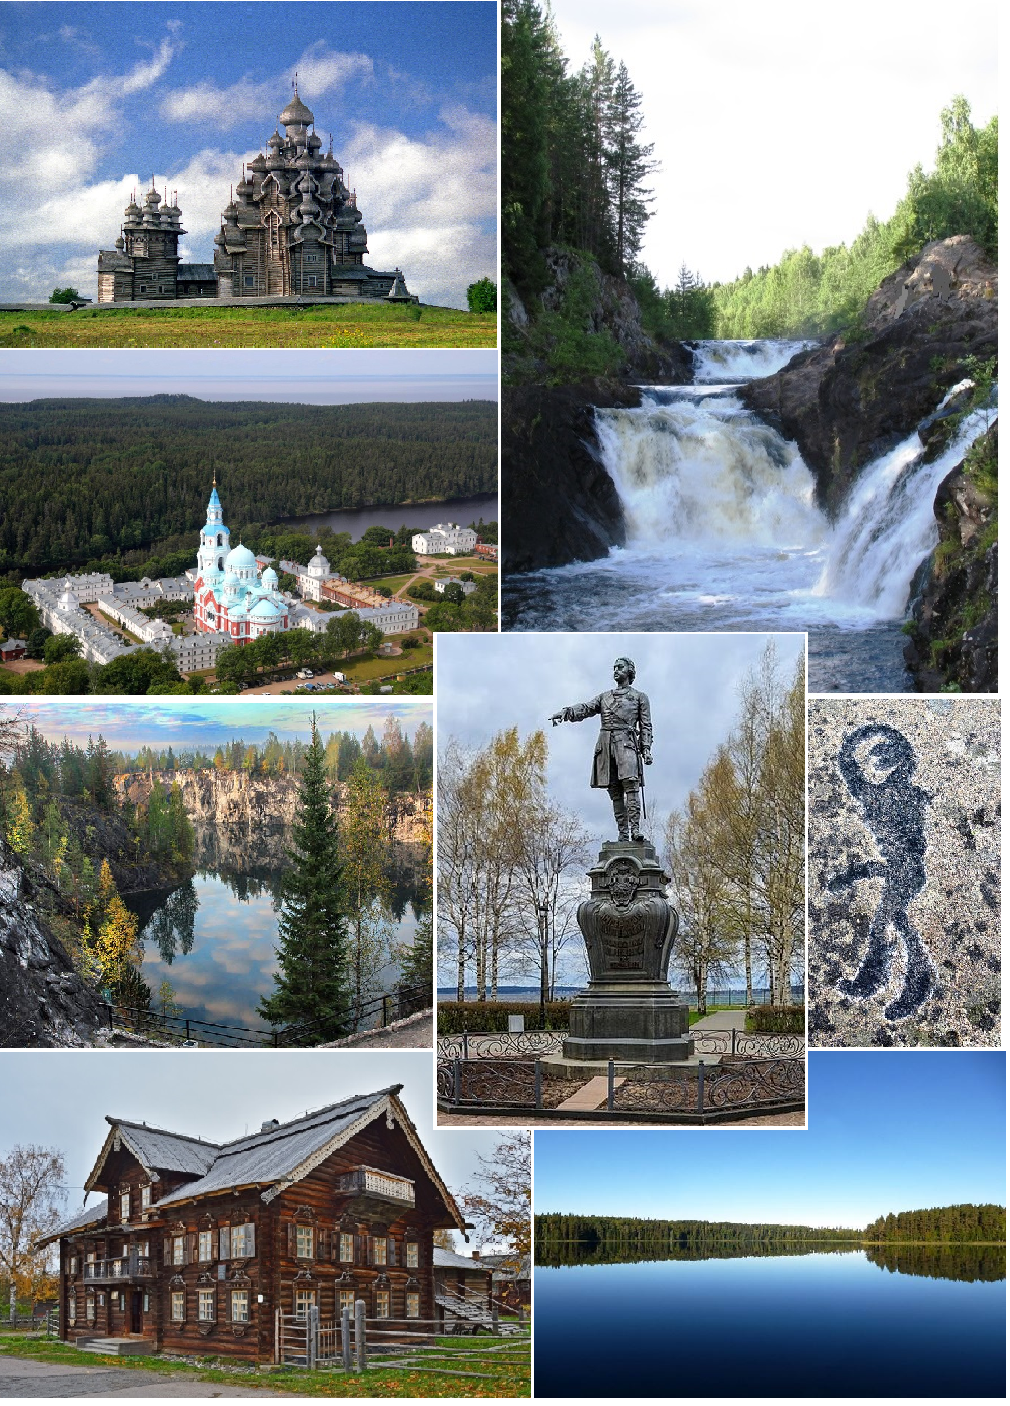 https://upload.wikimedia.org/wikipedia/commons/3/33/Karelia_Collage_2020.png